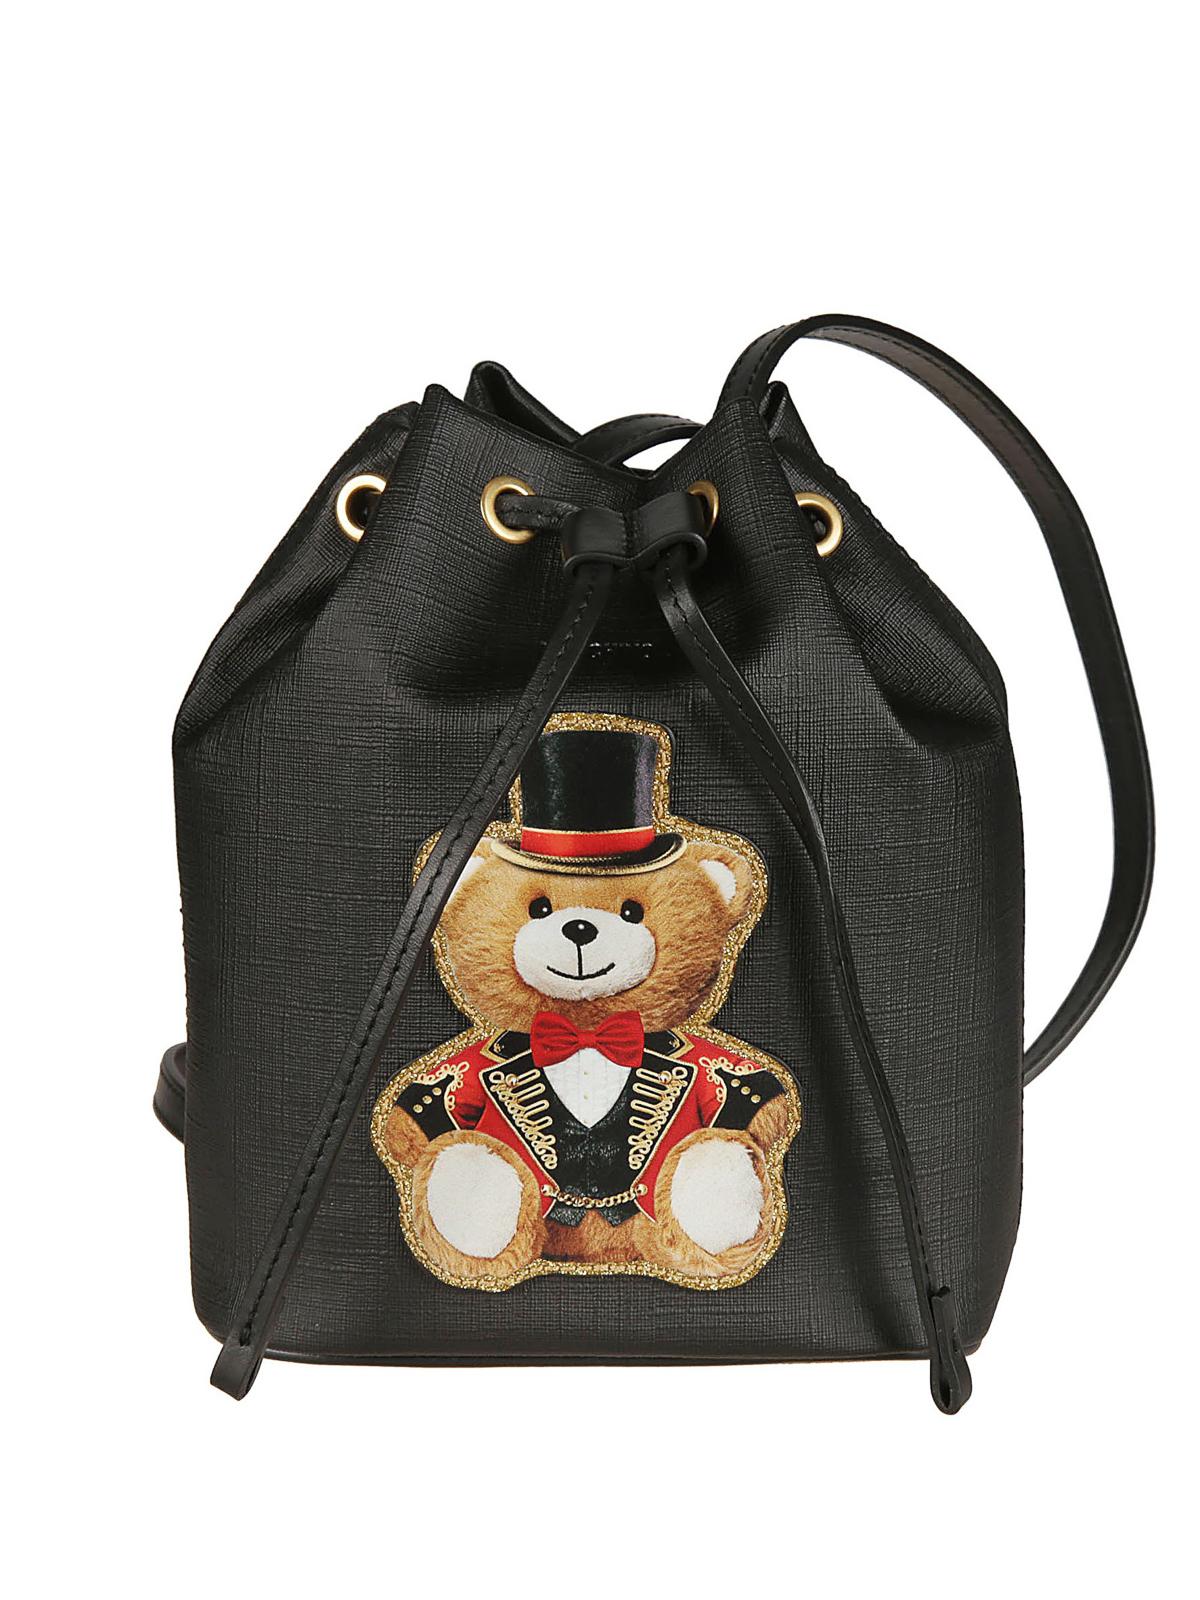 660fad0a07 Moschino - Teddy Bear Circus leather effect bucket bag - Bucket bags ...